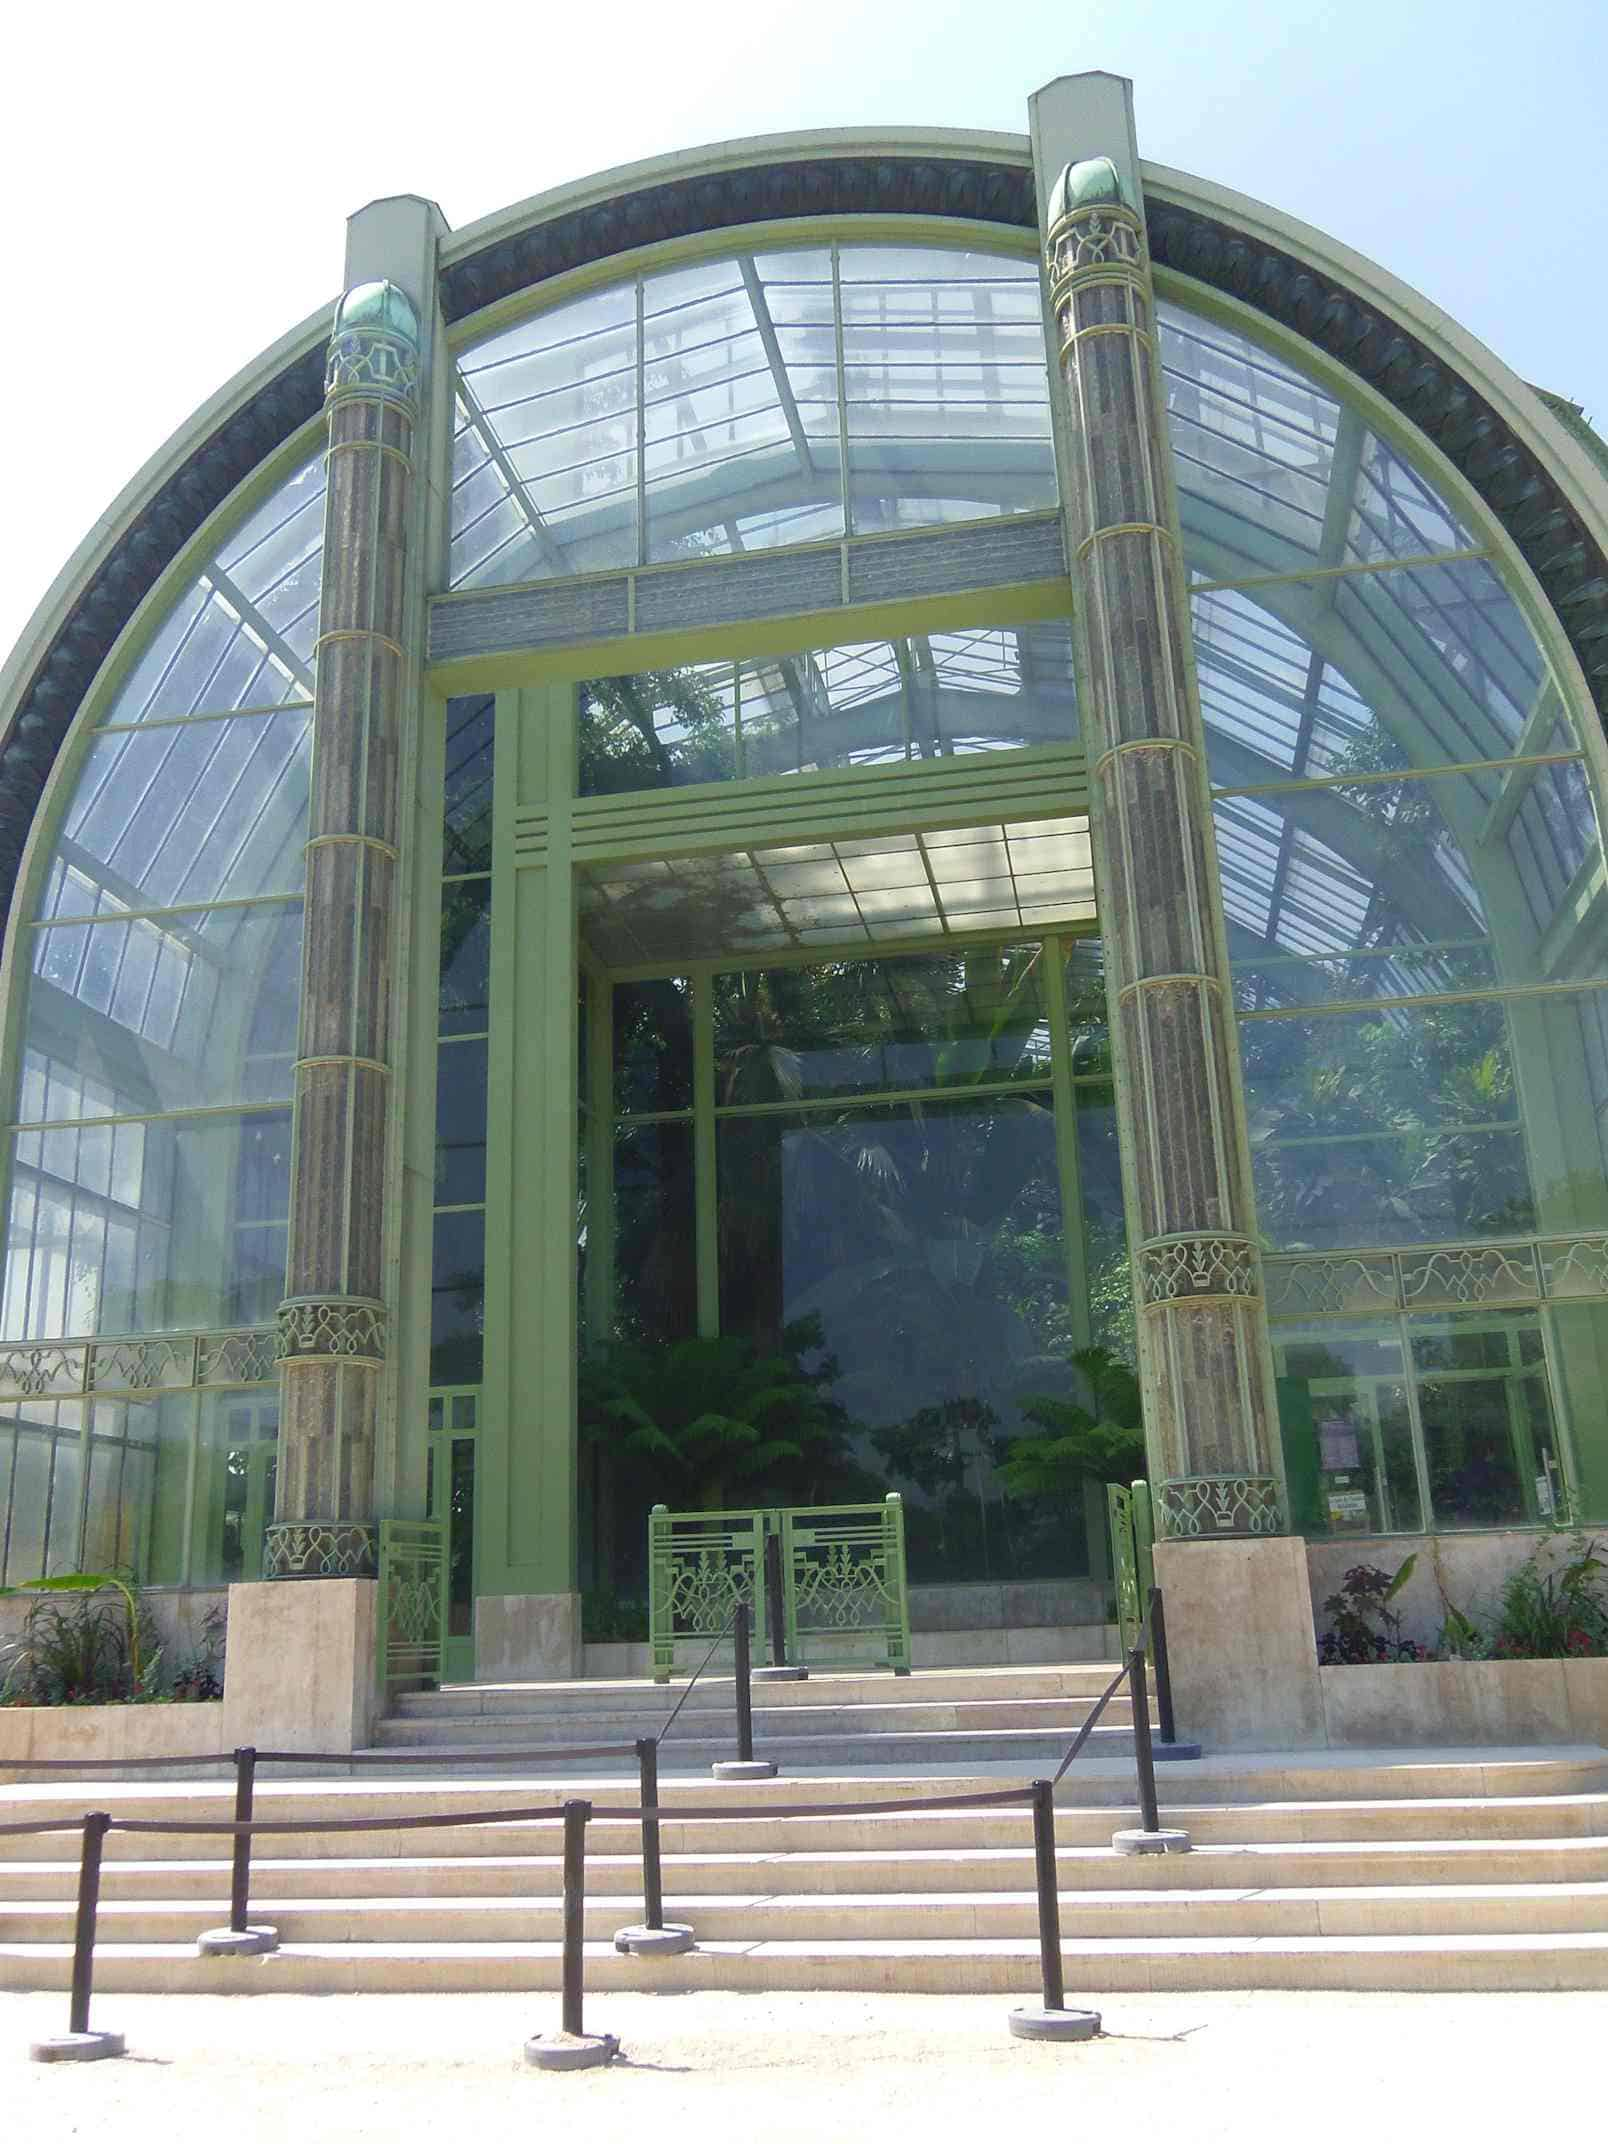 Serre in de Jardin des Plantes (c) Srsck